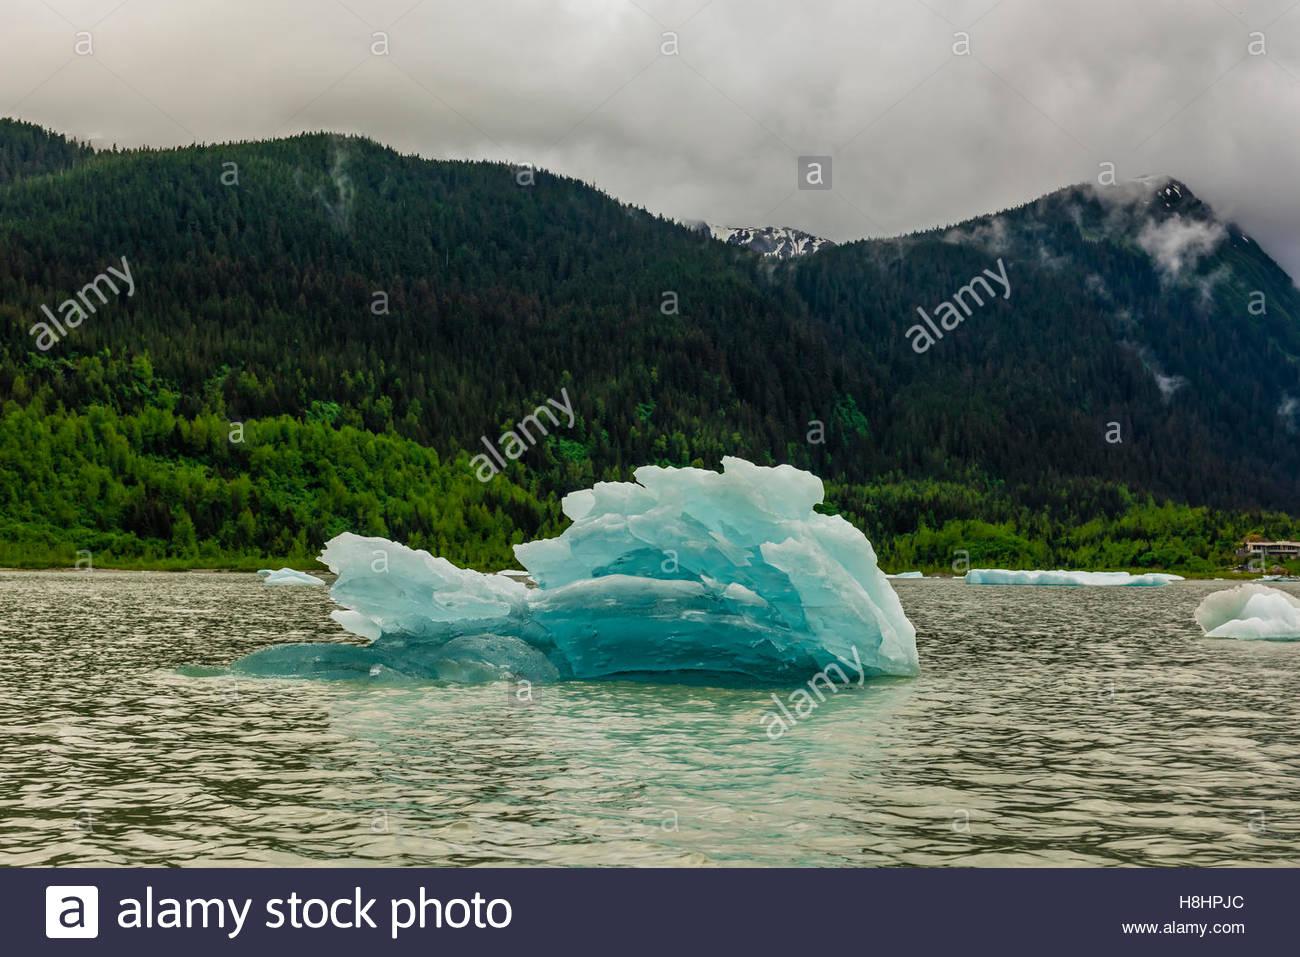 Floating ice, Mendenhall Lake, Juneau, Alaska USA. - Stock Image